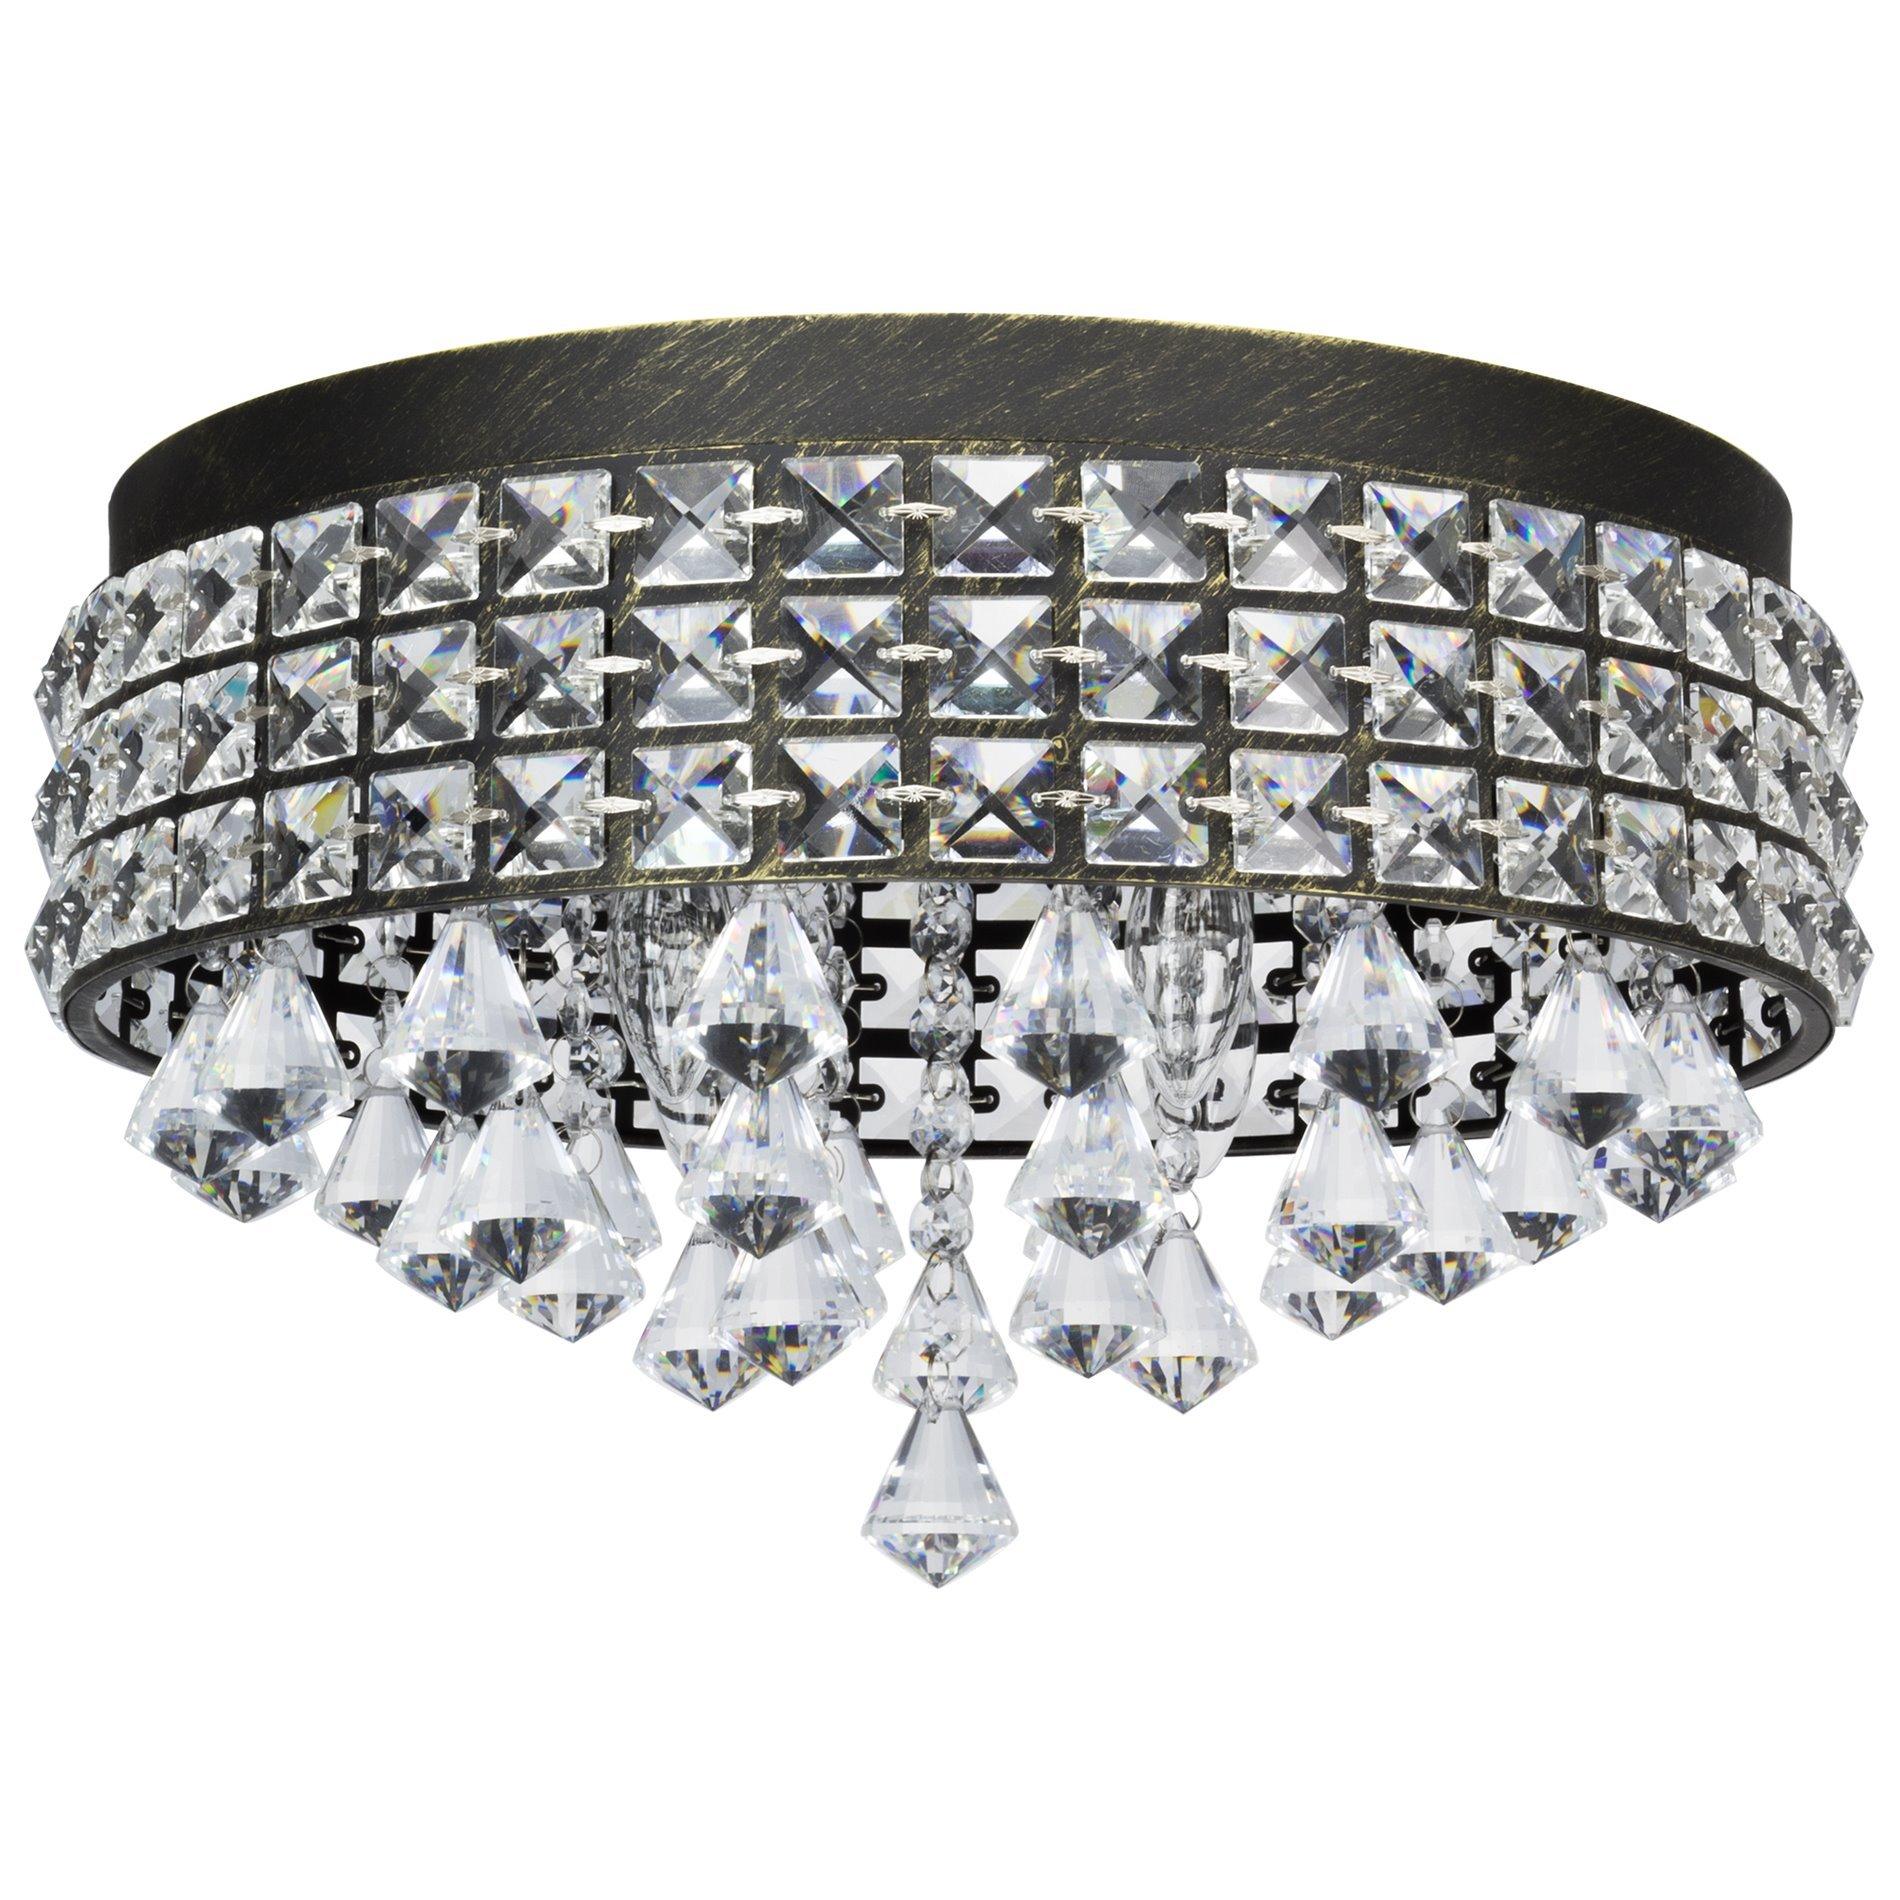 Revel/Kira Home Gemma 15'' 4-Light Flush Mount Crystal Chandelier, Brushed Black Finish